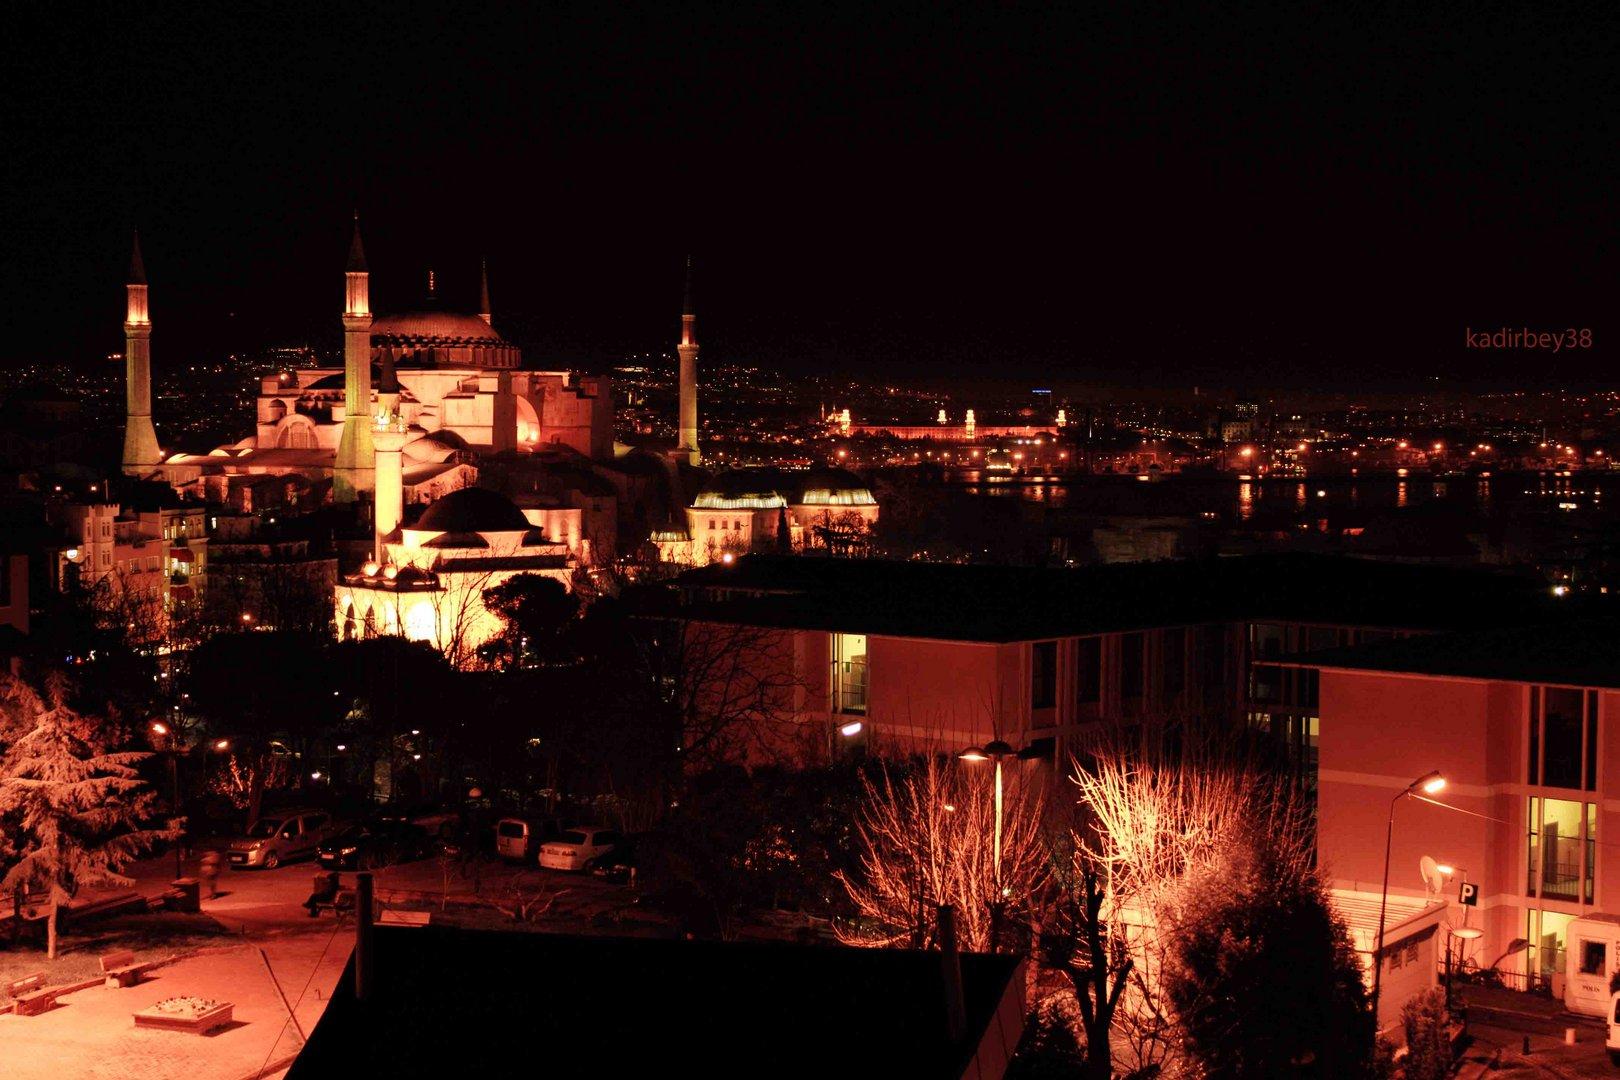 Istanbul Hagia Sophia nacht